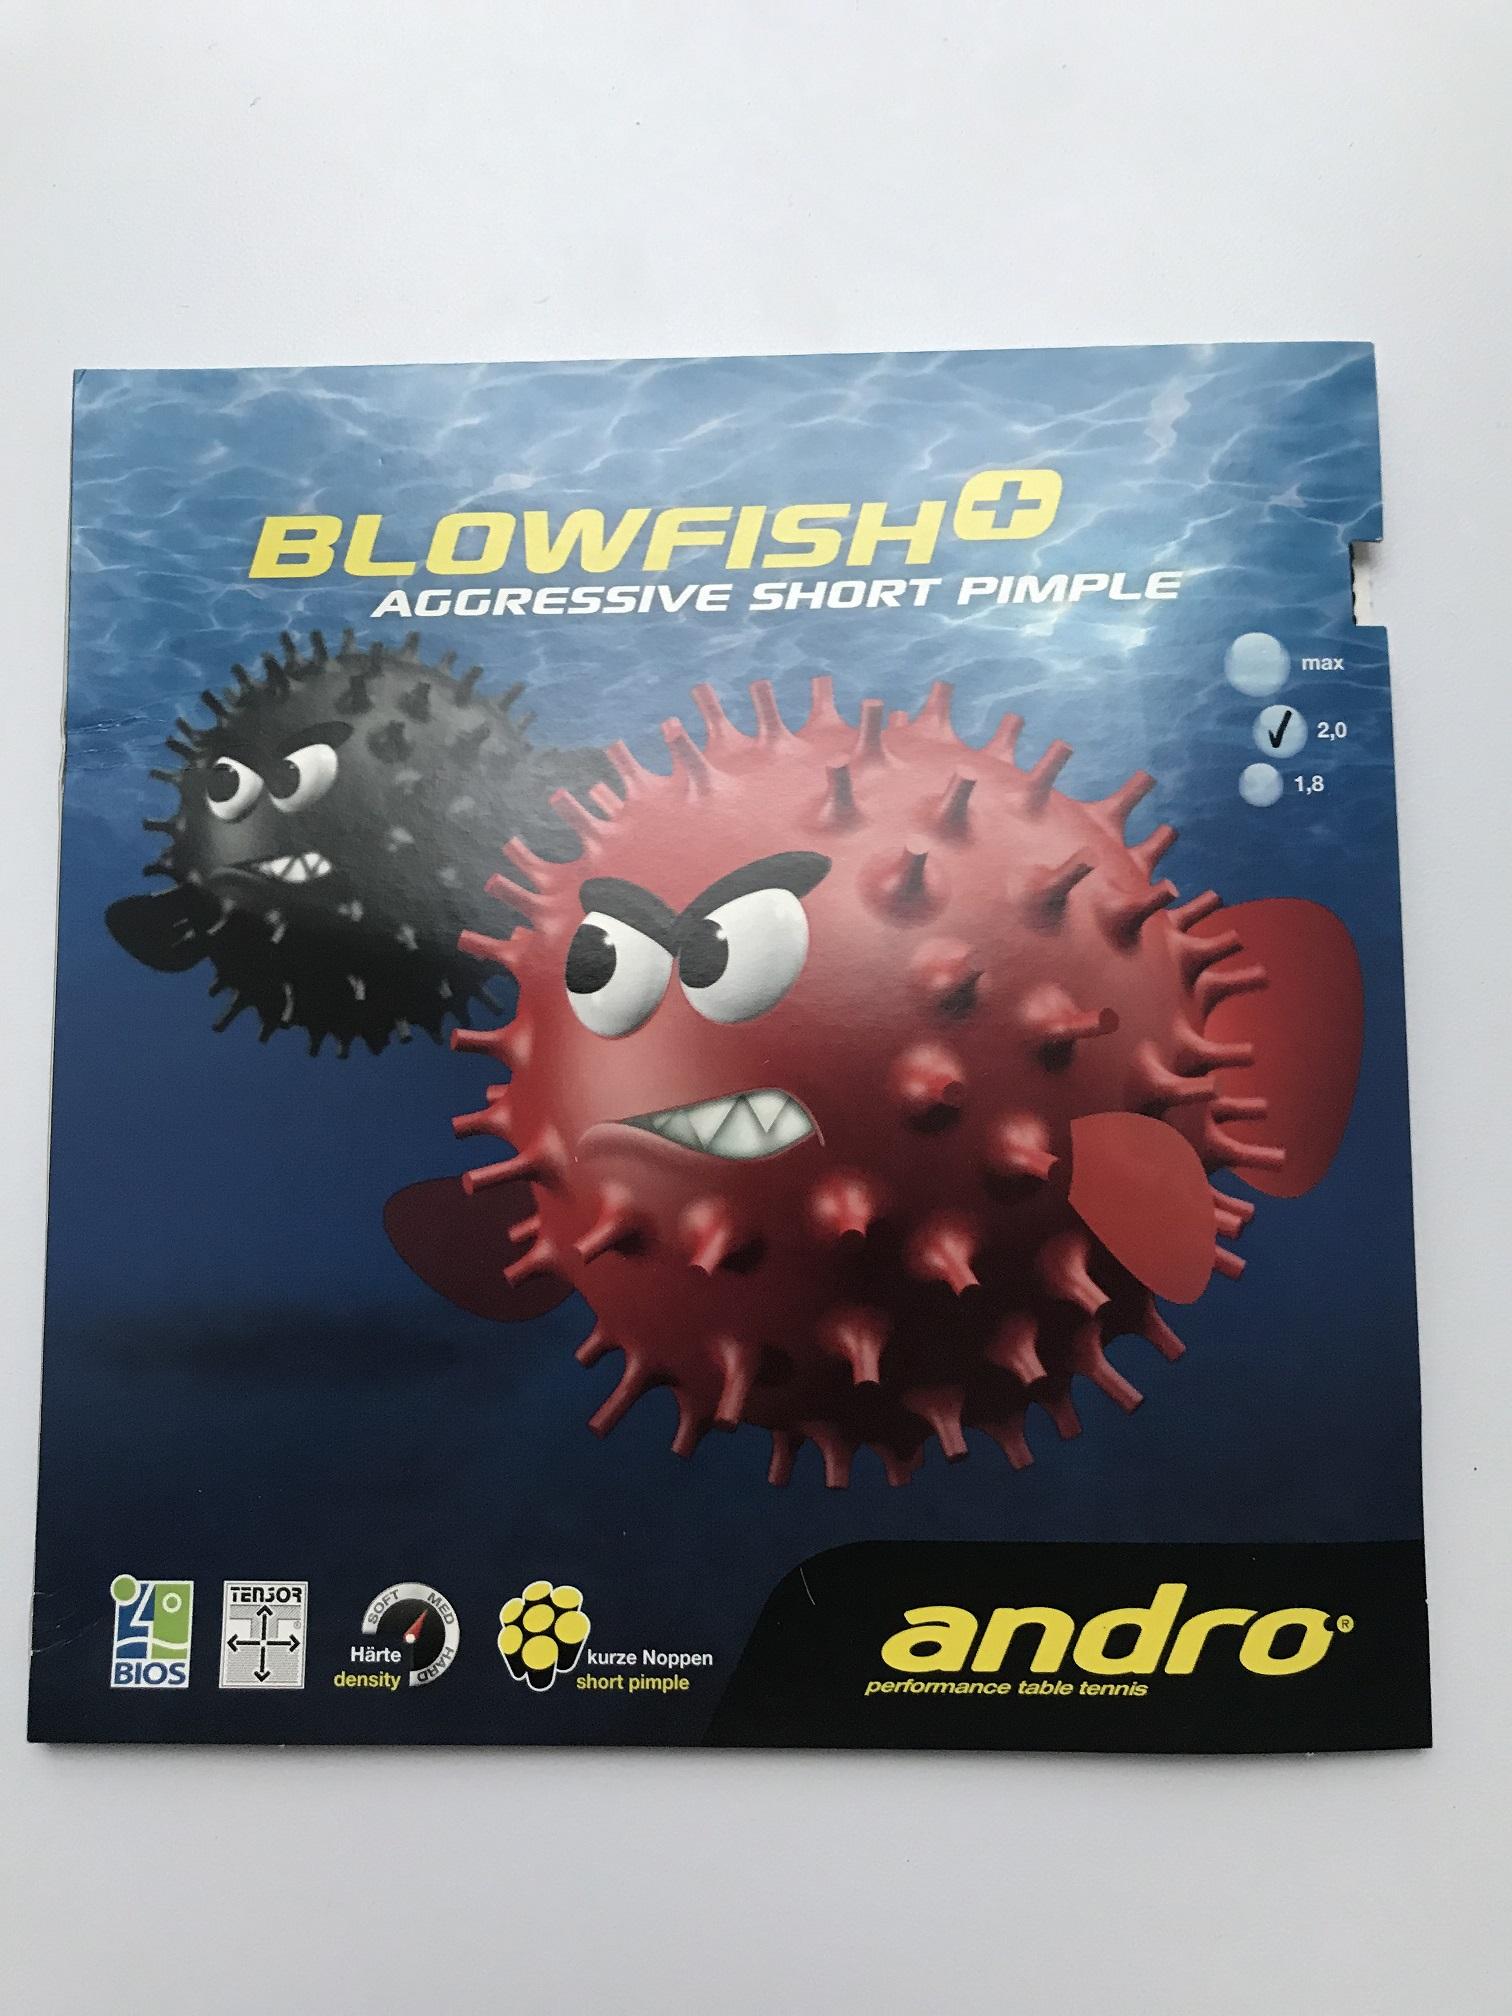 [продано] Продам накладку ANDRO Blowfish Plus, 2,0. КШ, чёрная, проба 15 минут